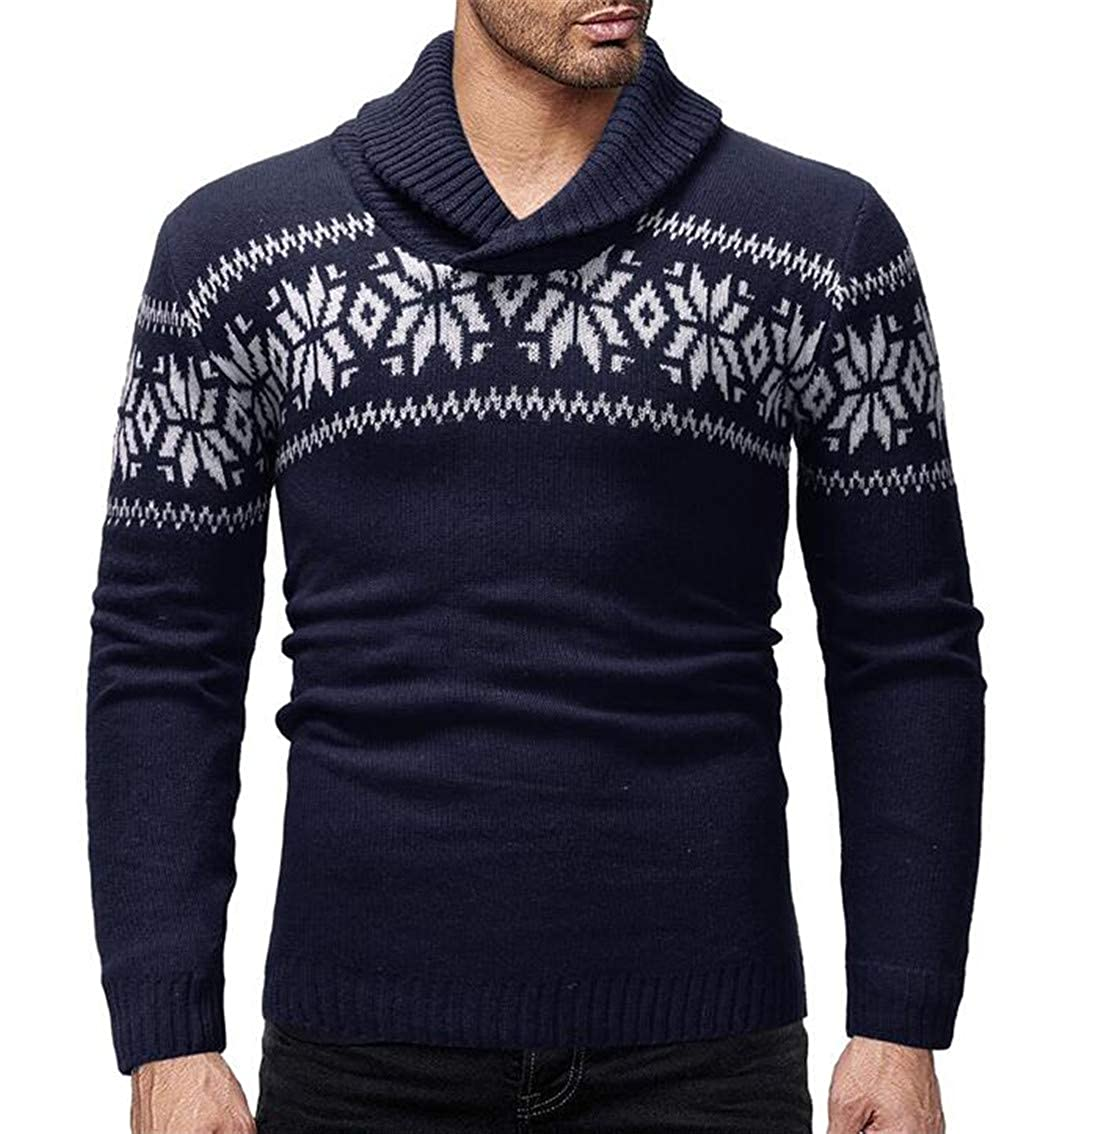 CRYYU Men Long Sleeve Christmas Knit Print Turtleneck Pullover Slim Sweater